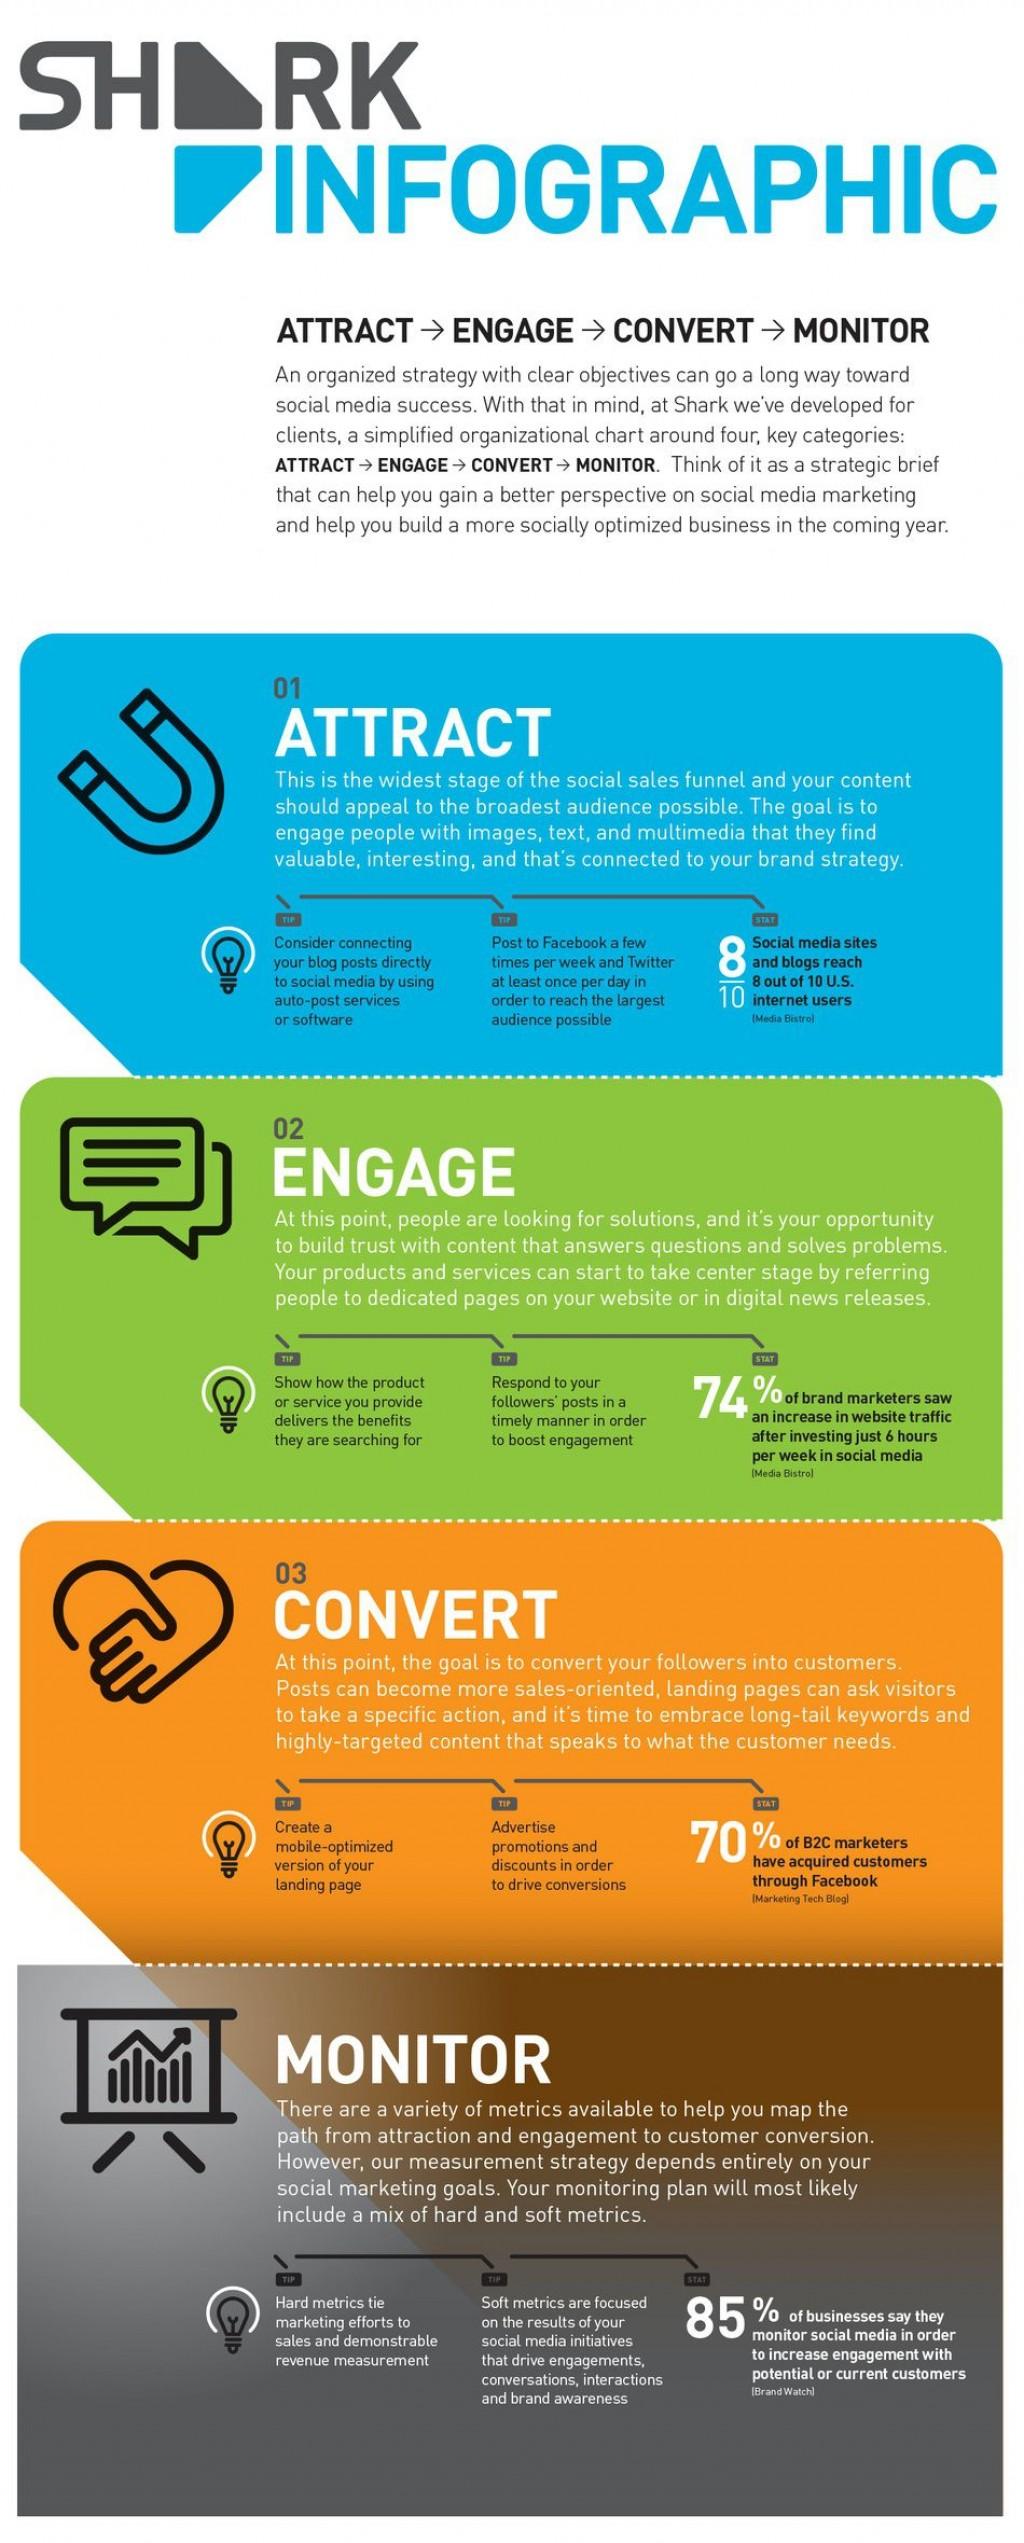 008 Imposing Social Media Marketing Plan Template 2018 Image Large